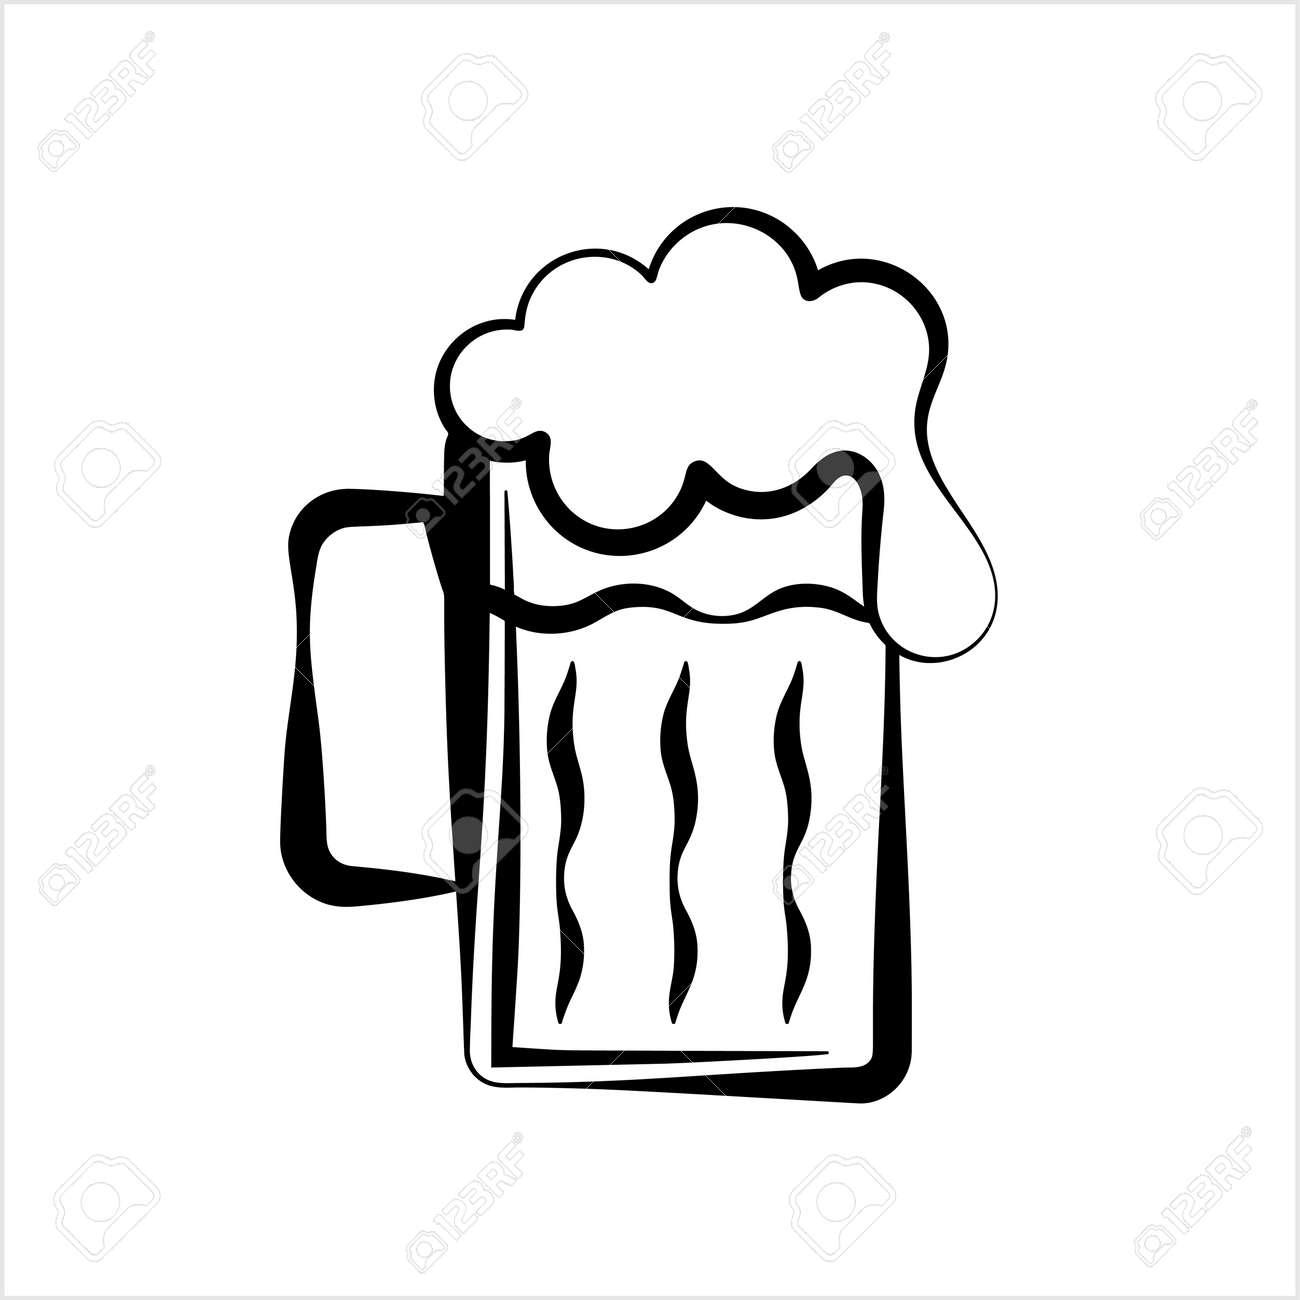 Beer Mug Icon Vector Art Illustration Royalty Free Cliparts Vectors And Stock Illustration Image 147817791